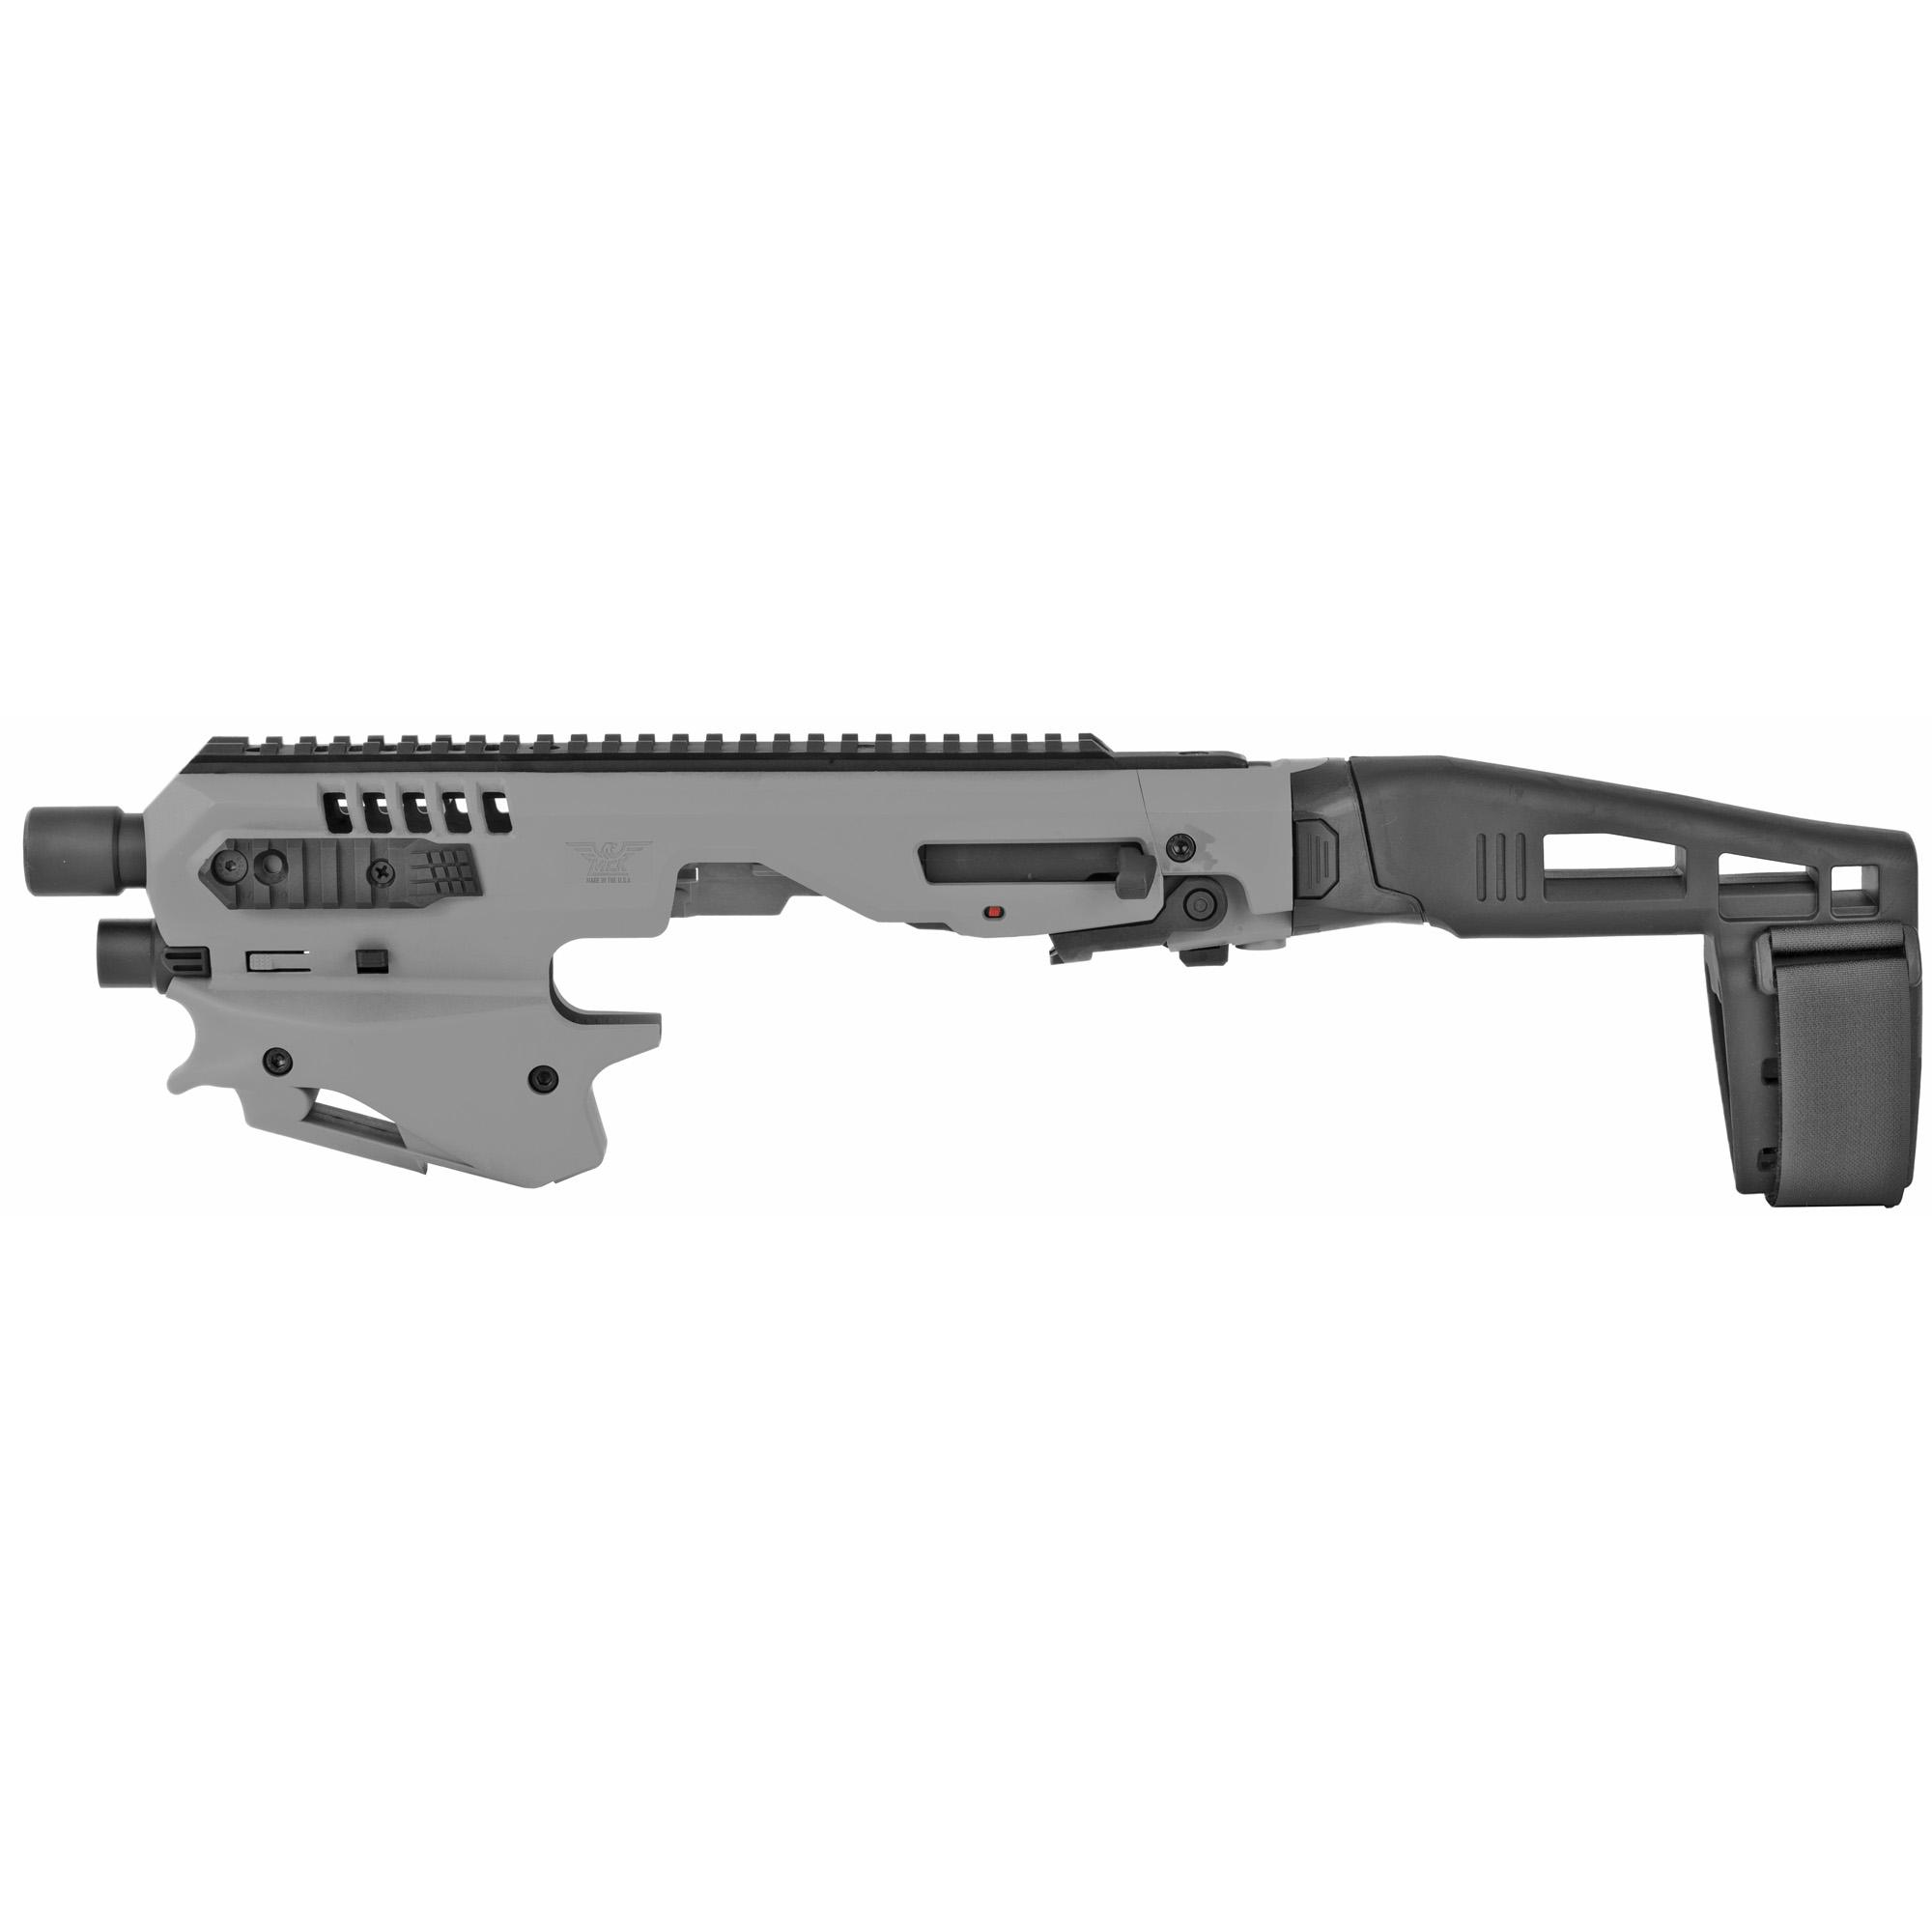 Caa Micro Conv Kit For Glock 20 Tung